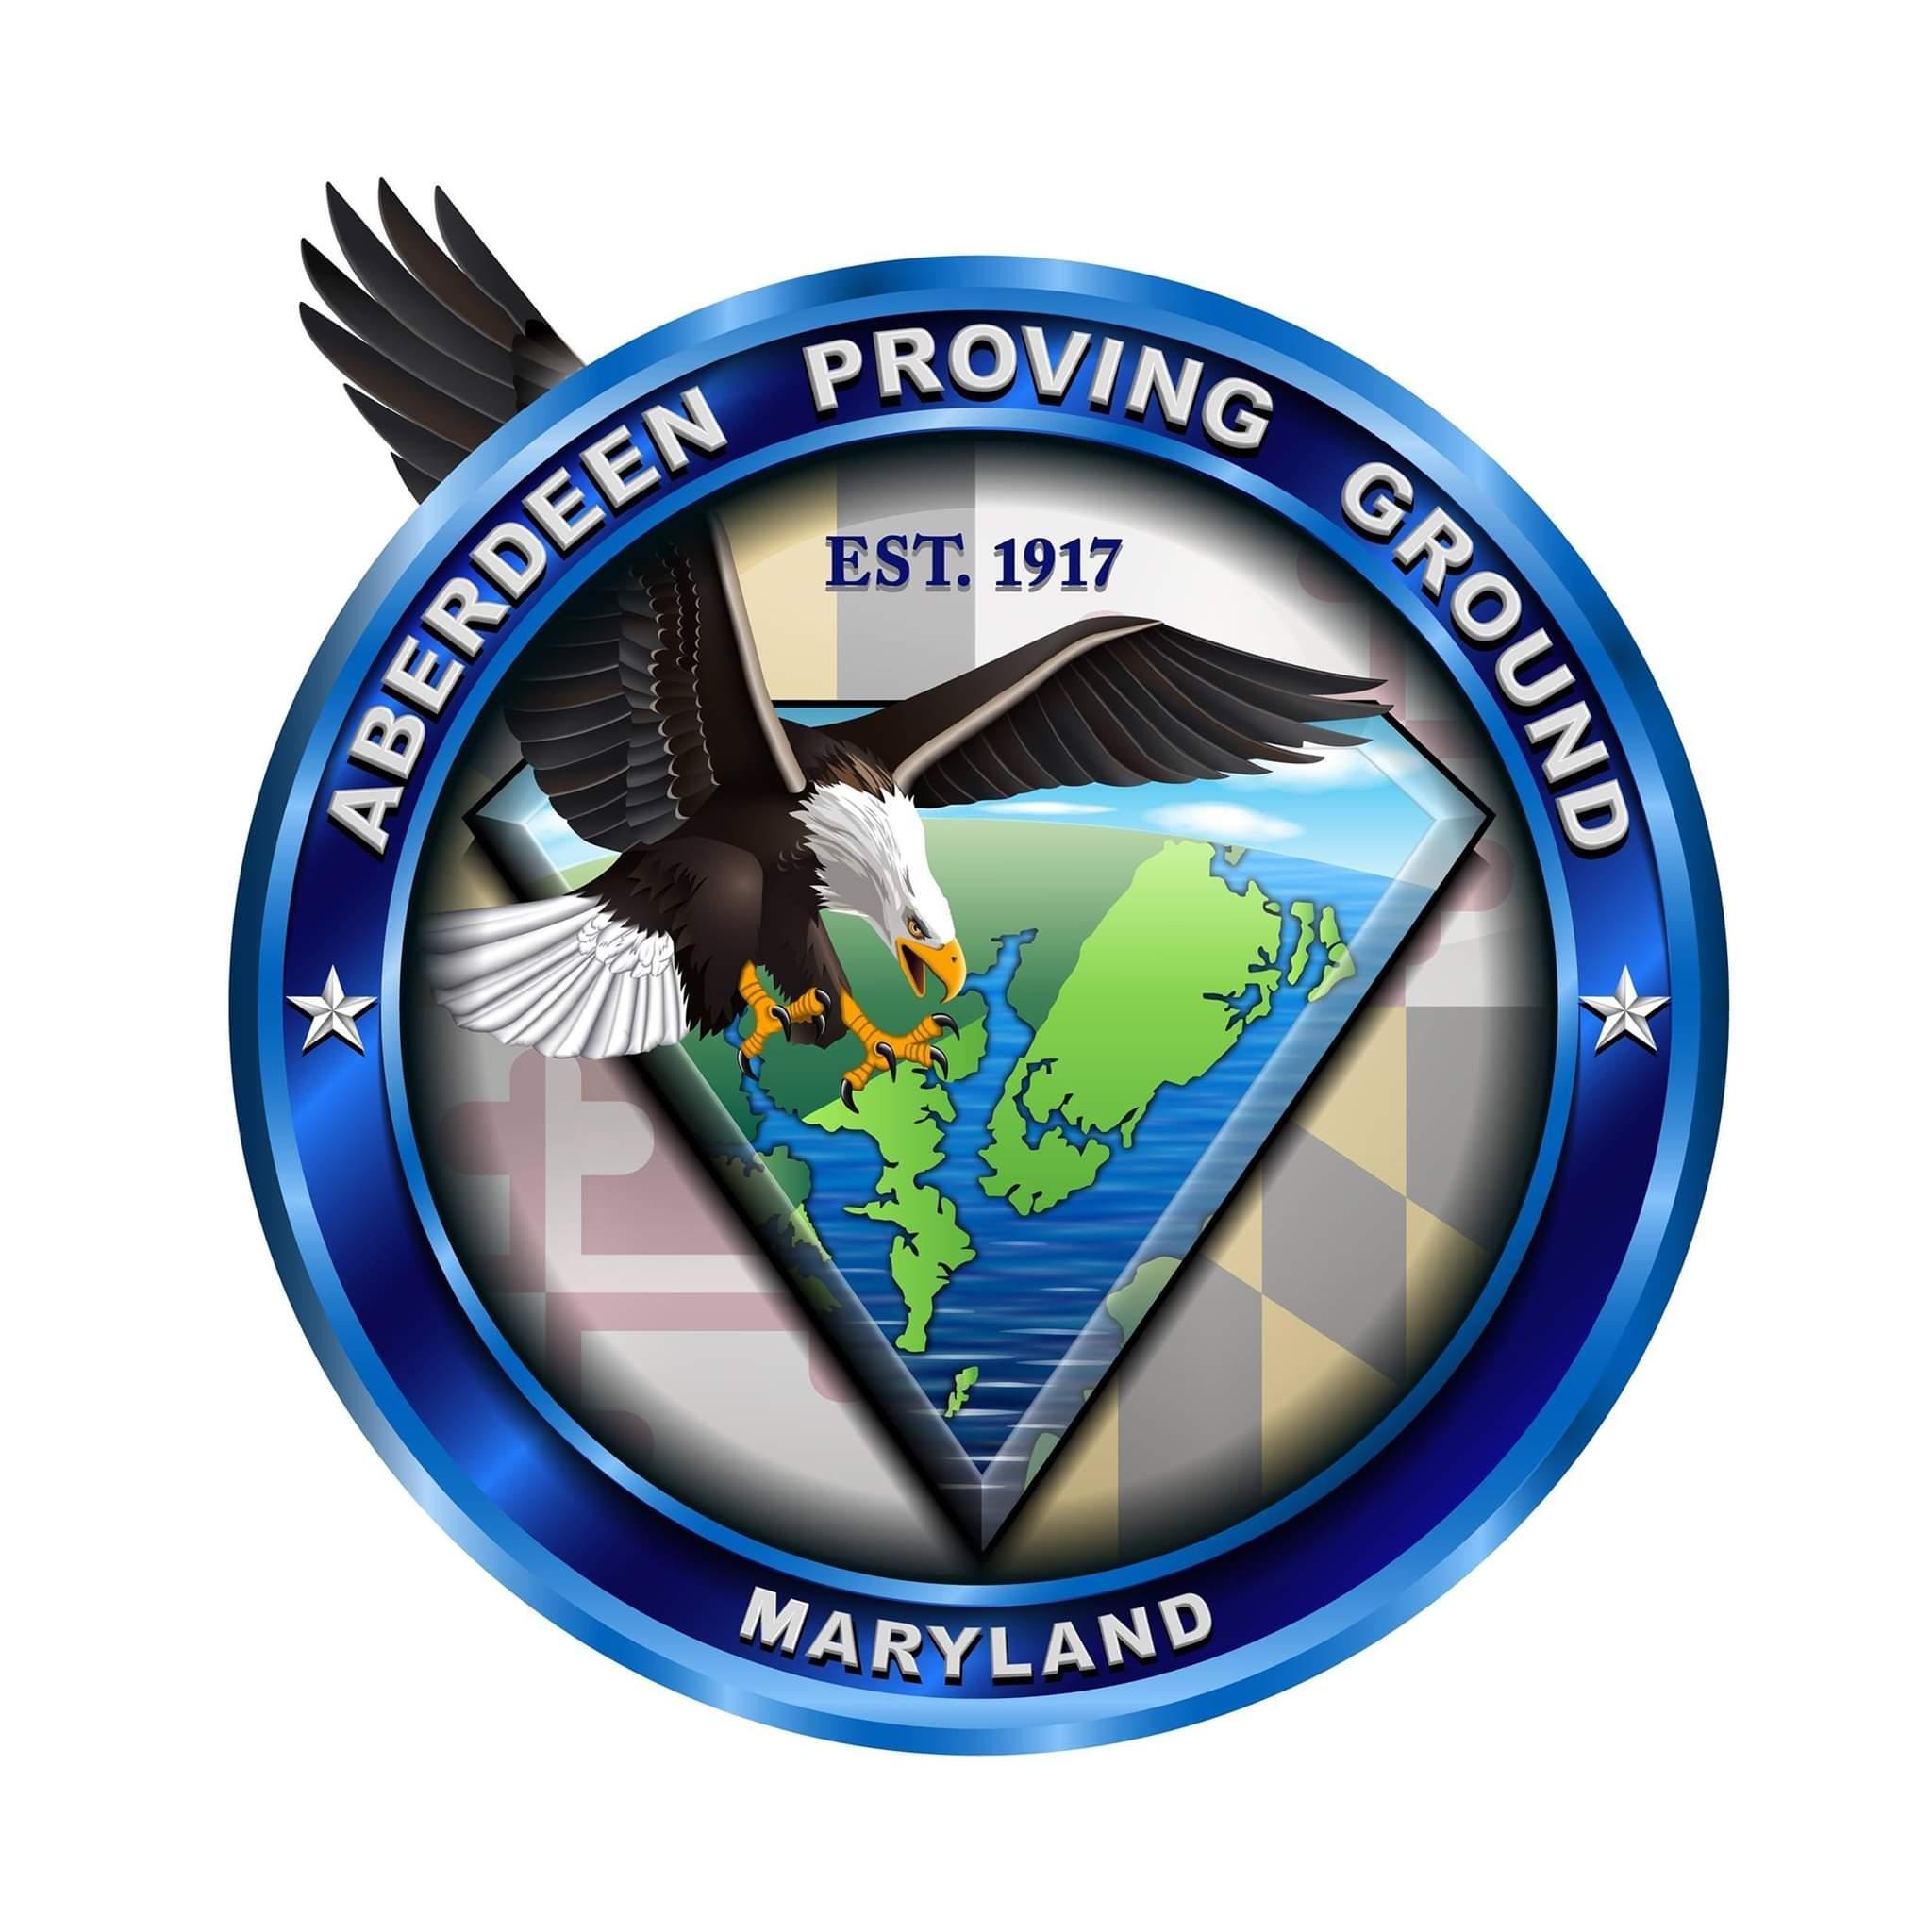 Aberdeen Proving Ground badge.